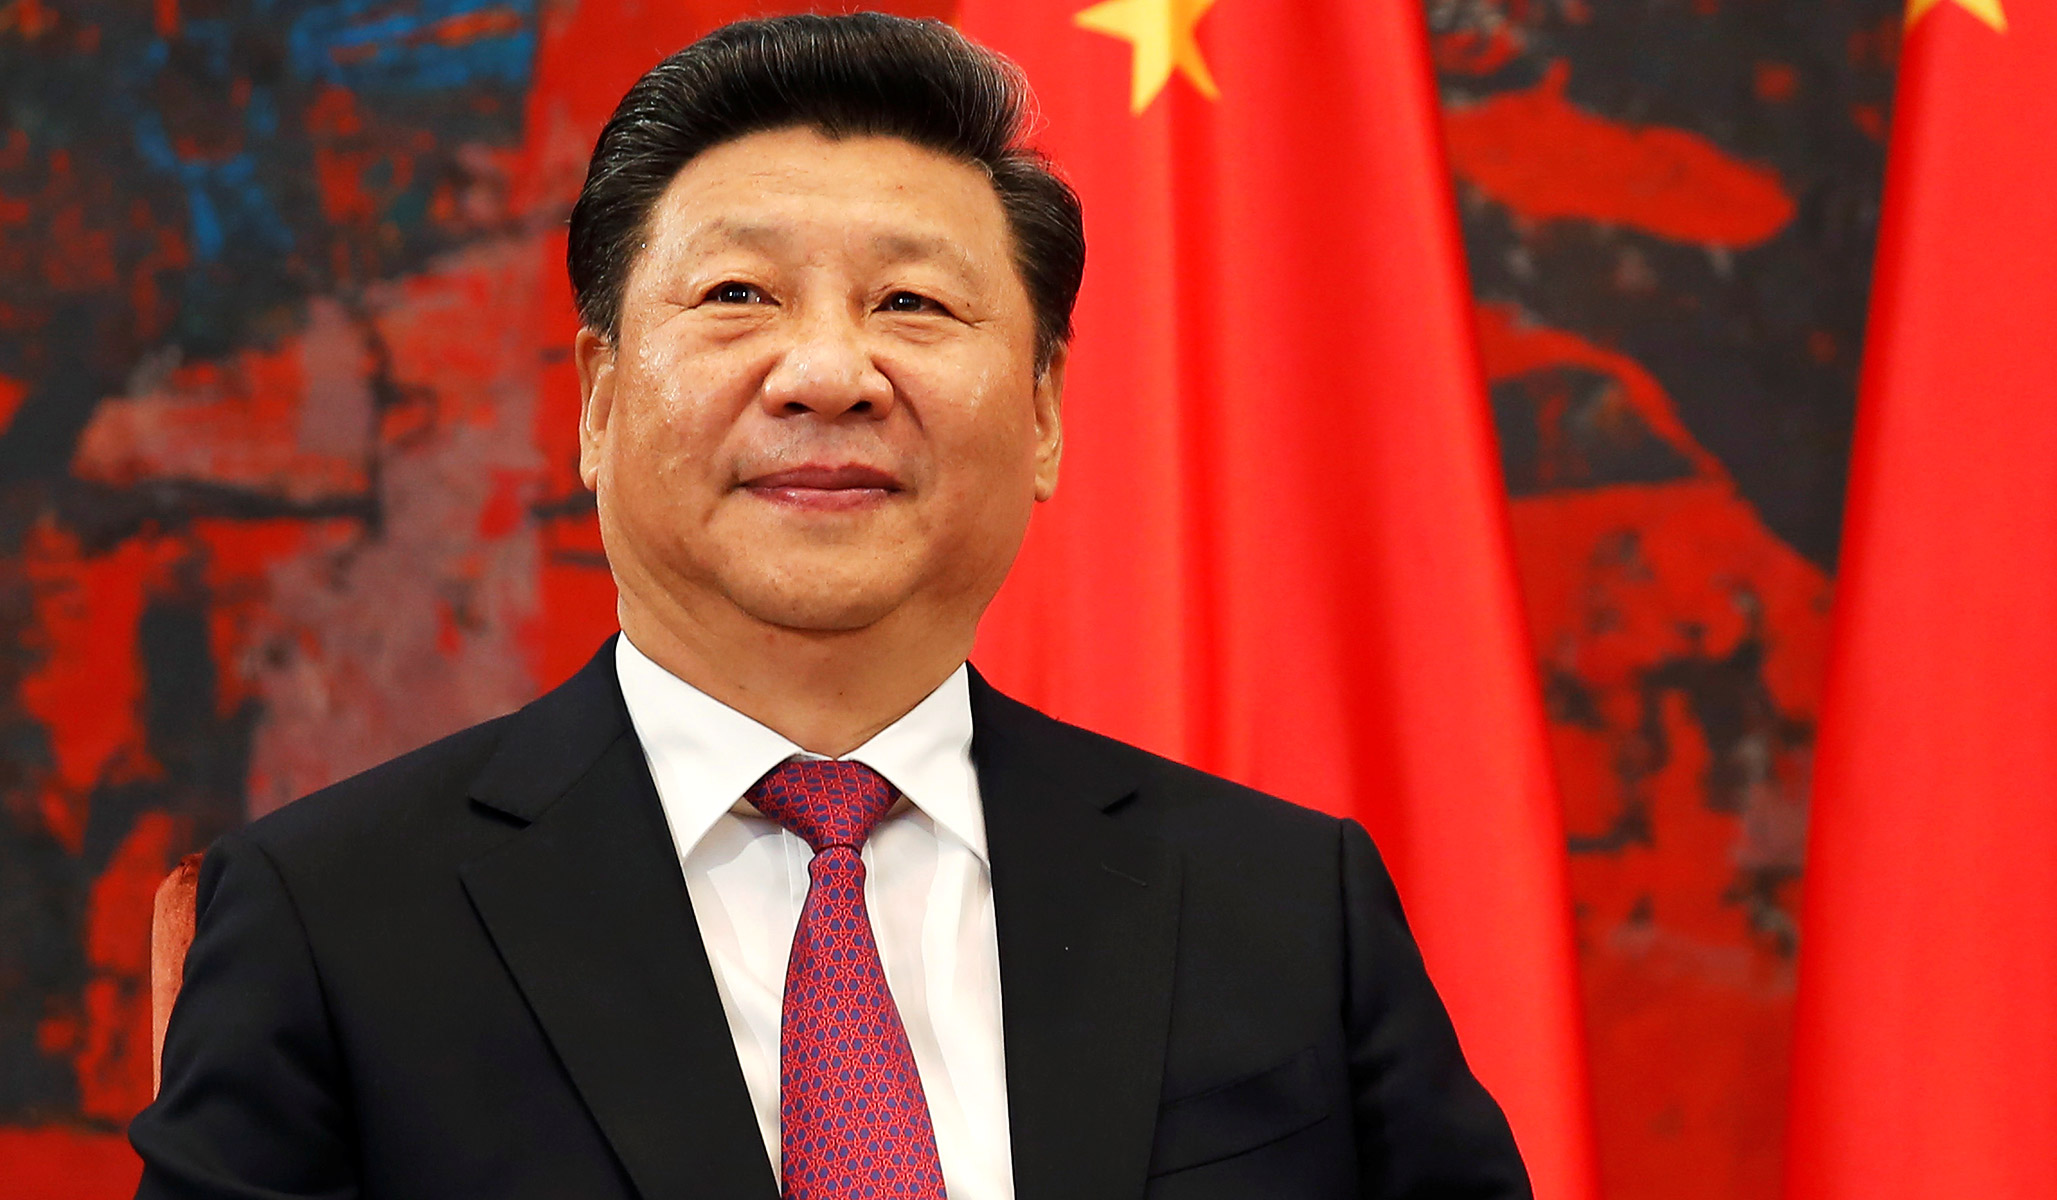 Xi Jinping Ramps Up Religious Persecution